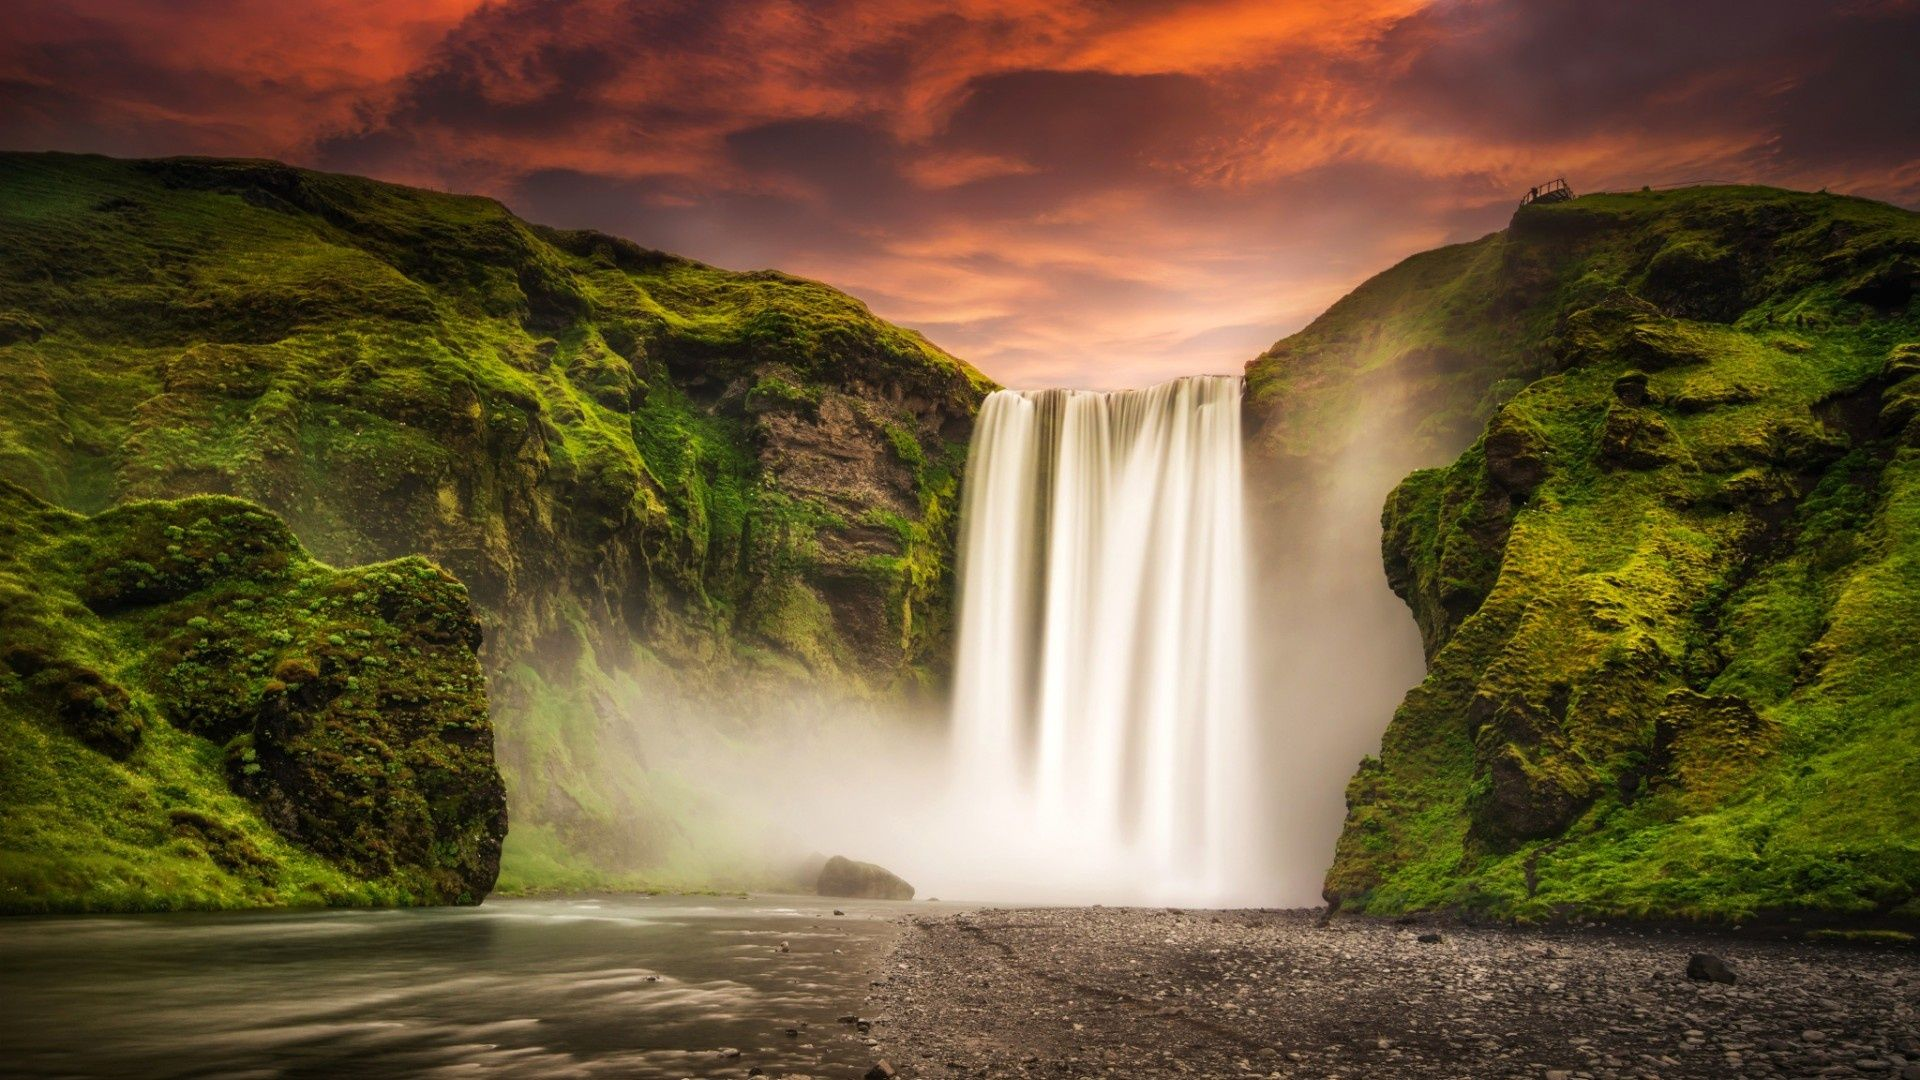 Skogafoss Waterfall Iceland Wallpaper [1920 x 1080] Need